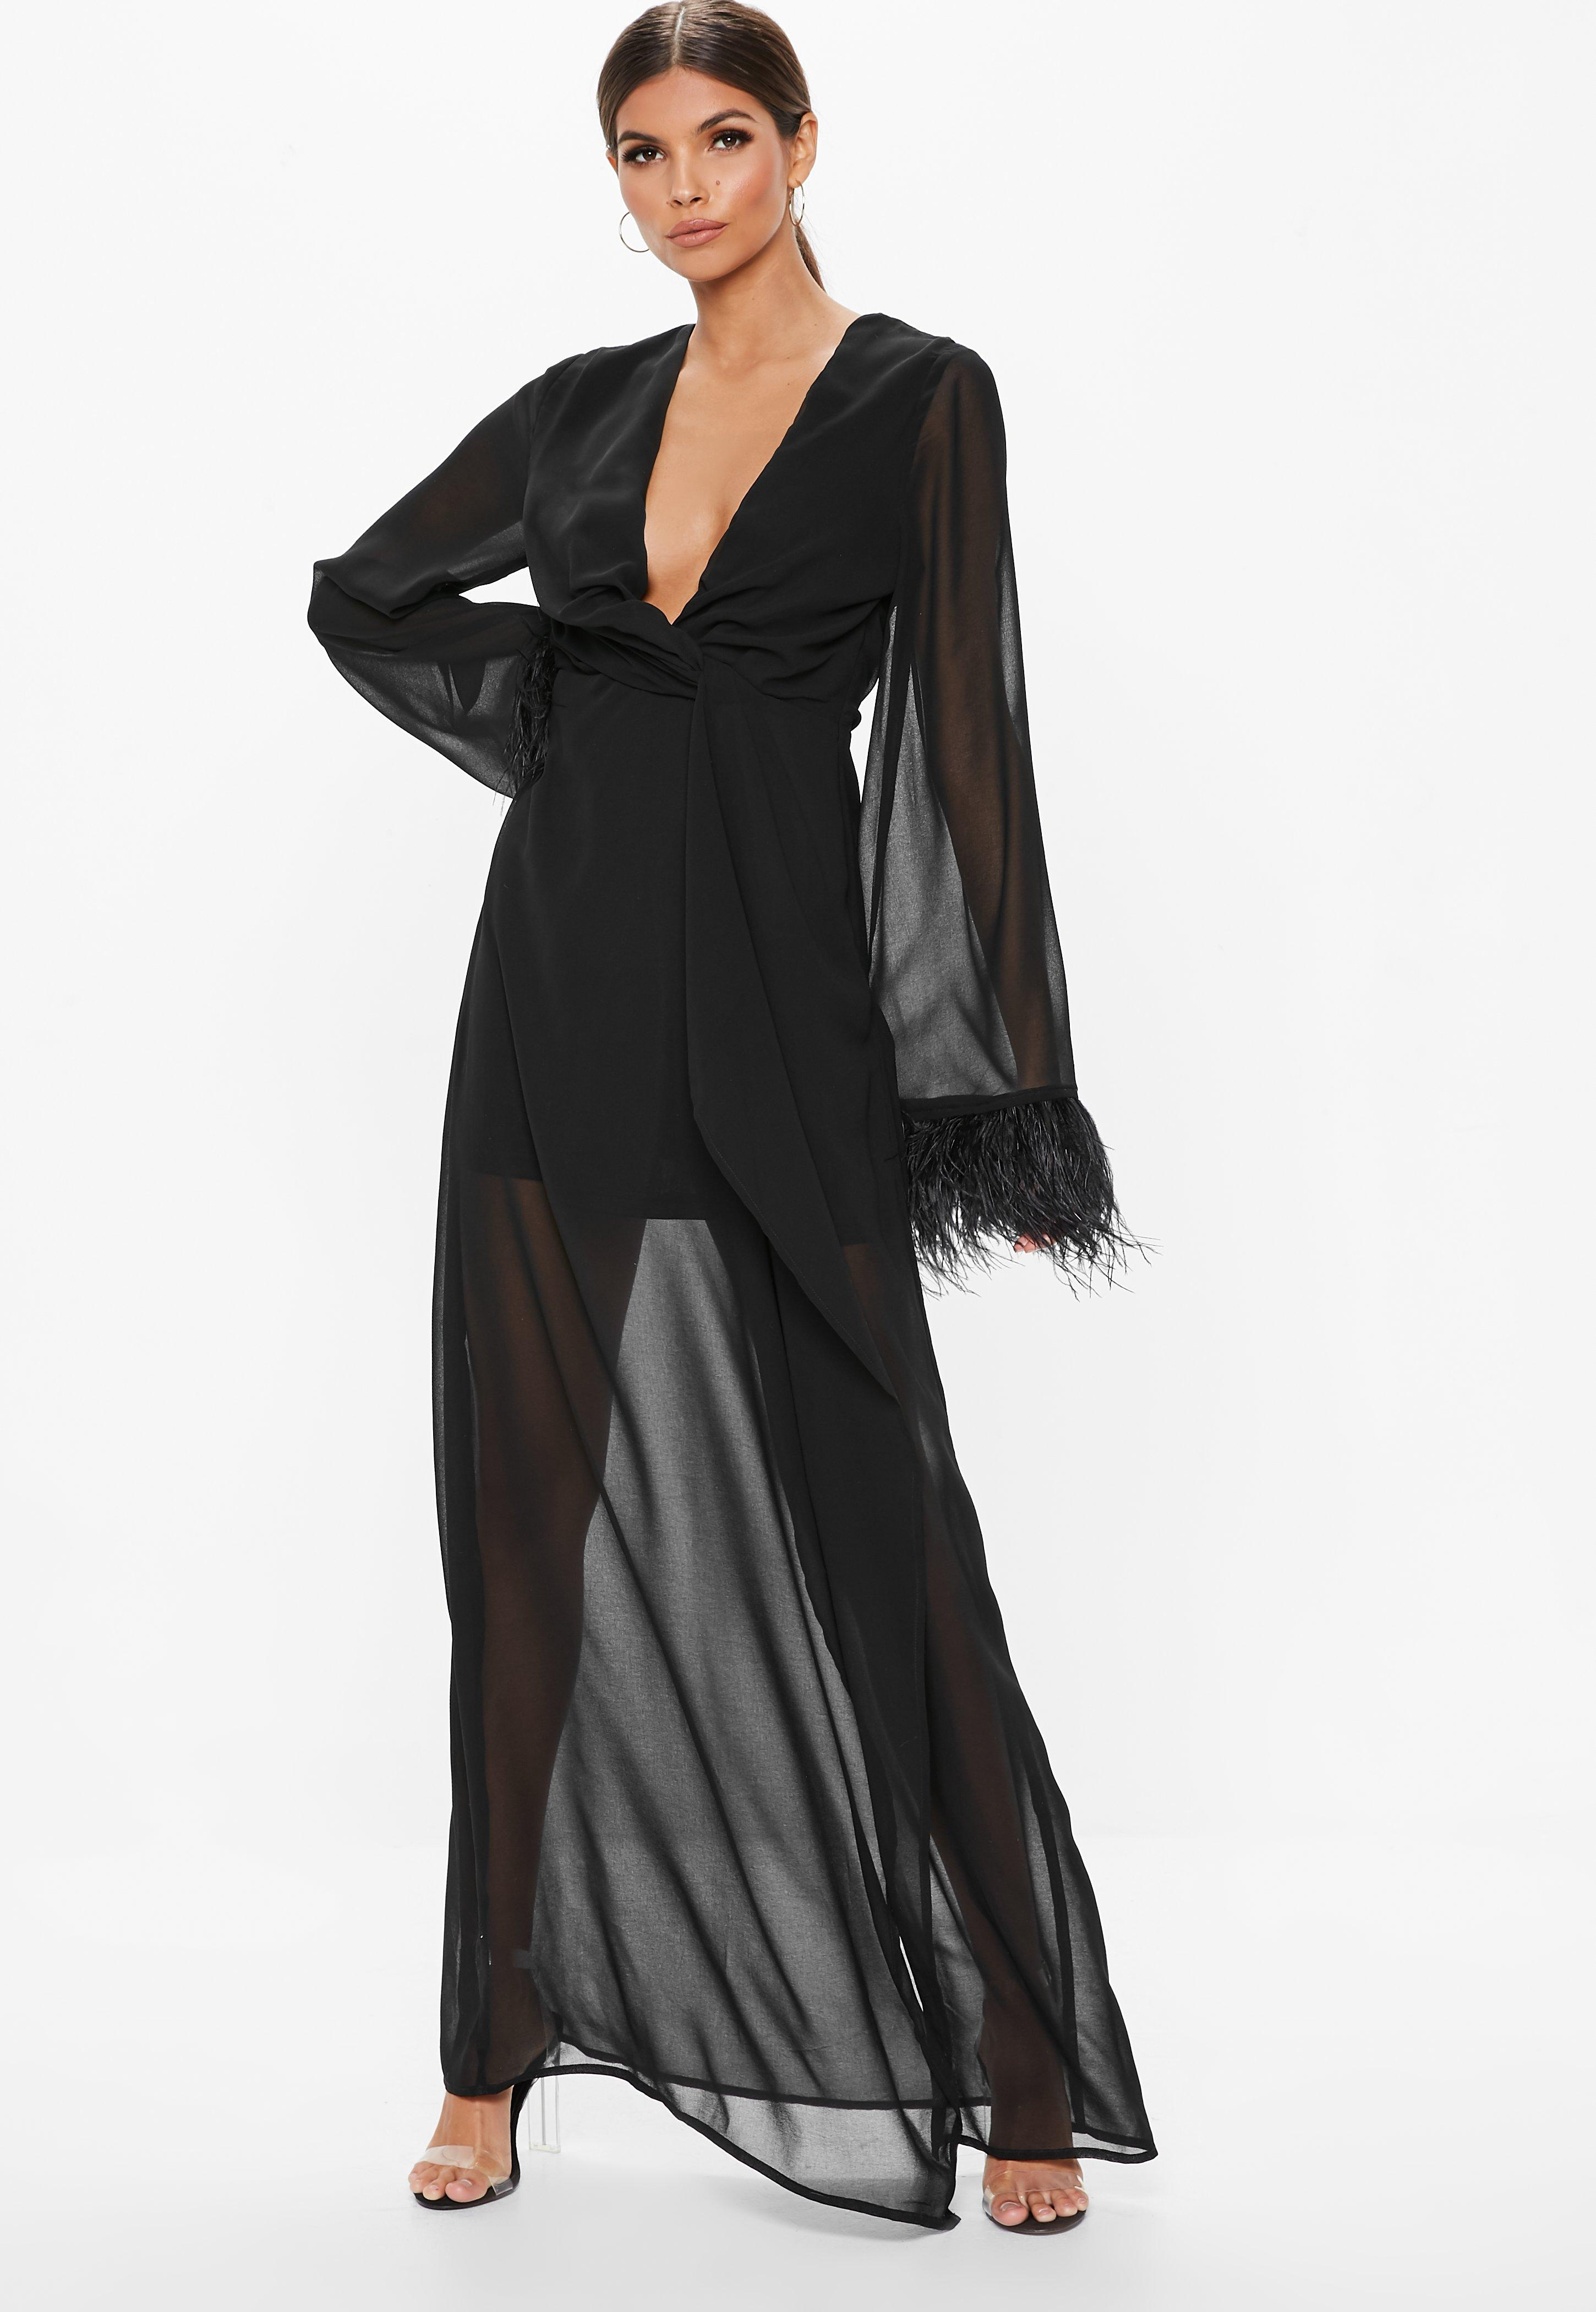 a7d4e3bdf2 Black Twist Front Sheer Feather Trim Maxi Dress   Missguided